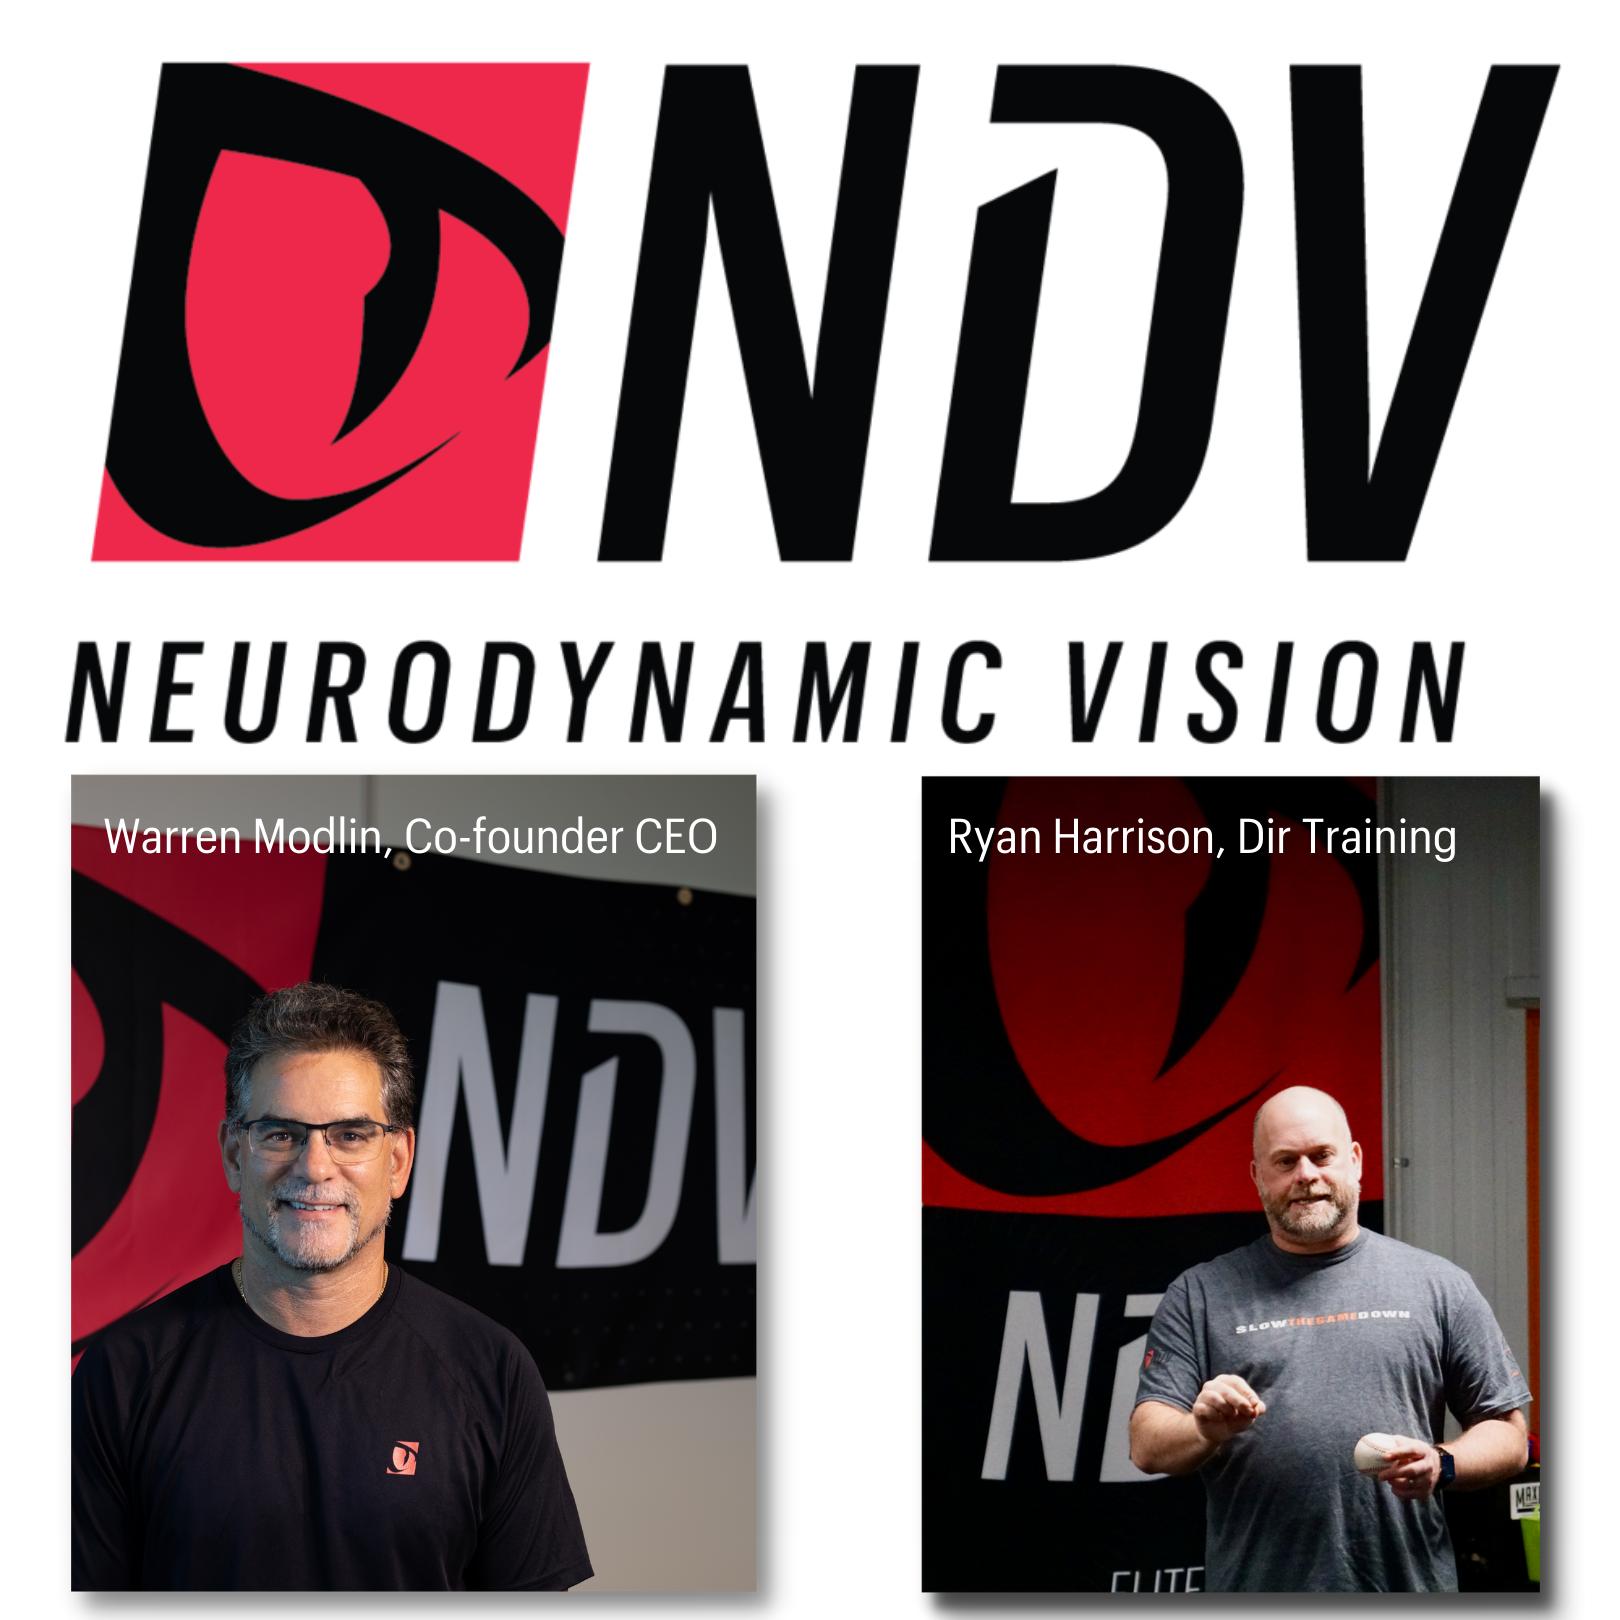 NueroDynamic Vision